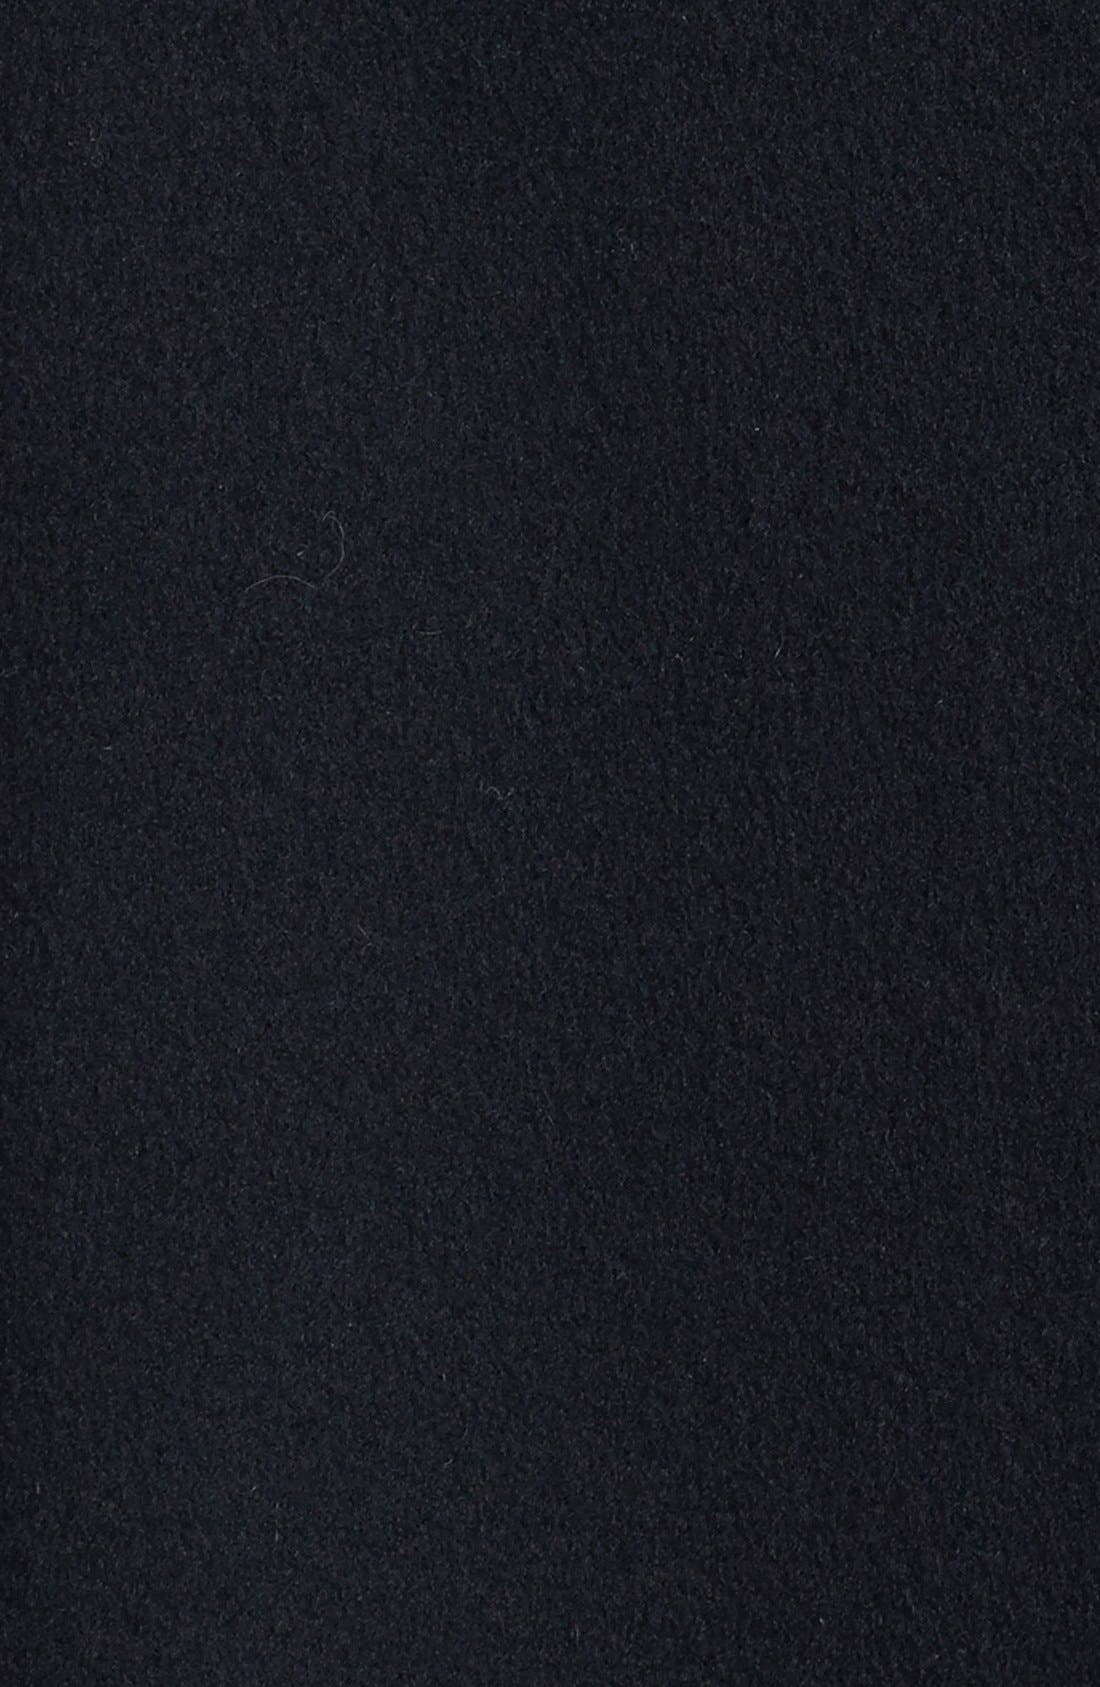 Alternate Image 3  - Fleurette Genuine Mink Fur Trim Loro Piana Wool Coat (Petite)